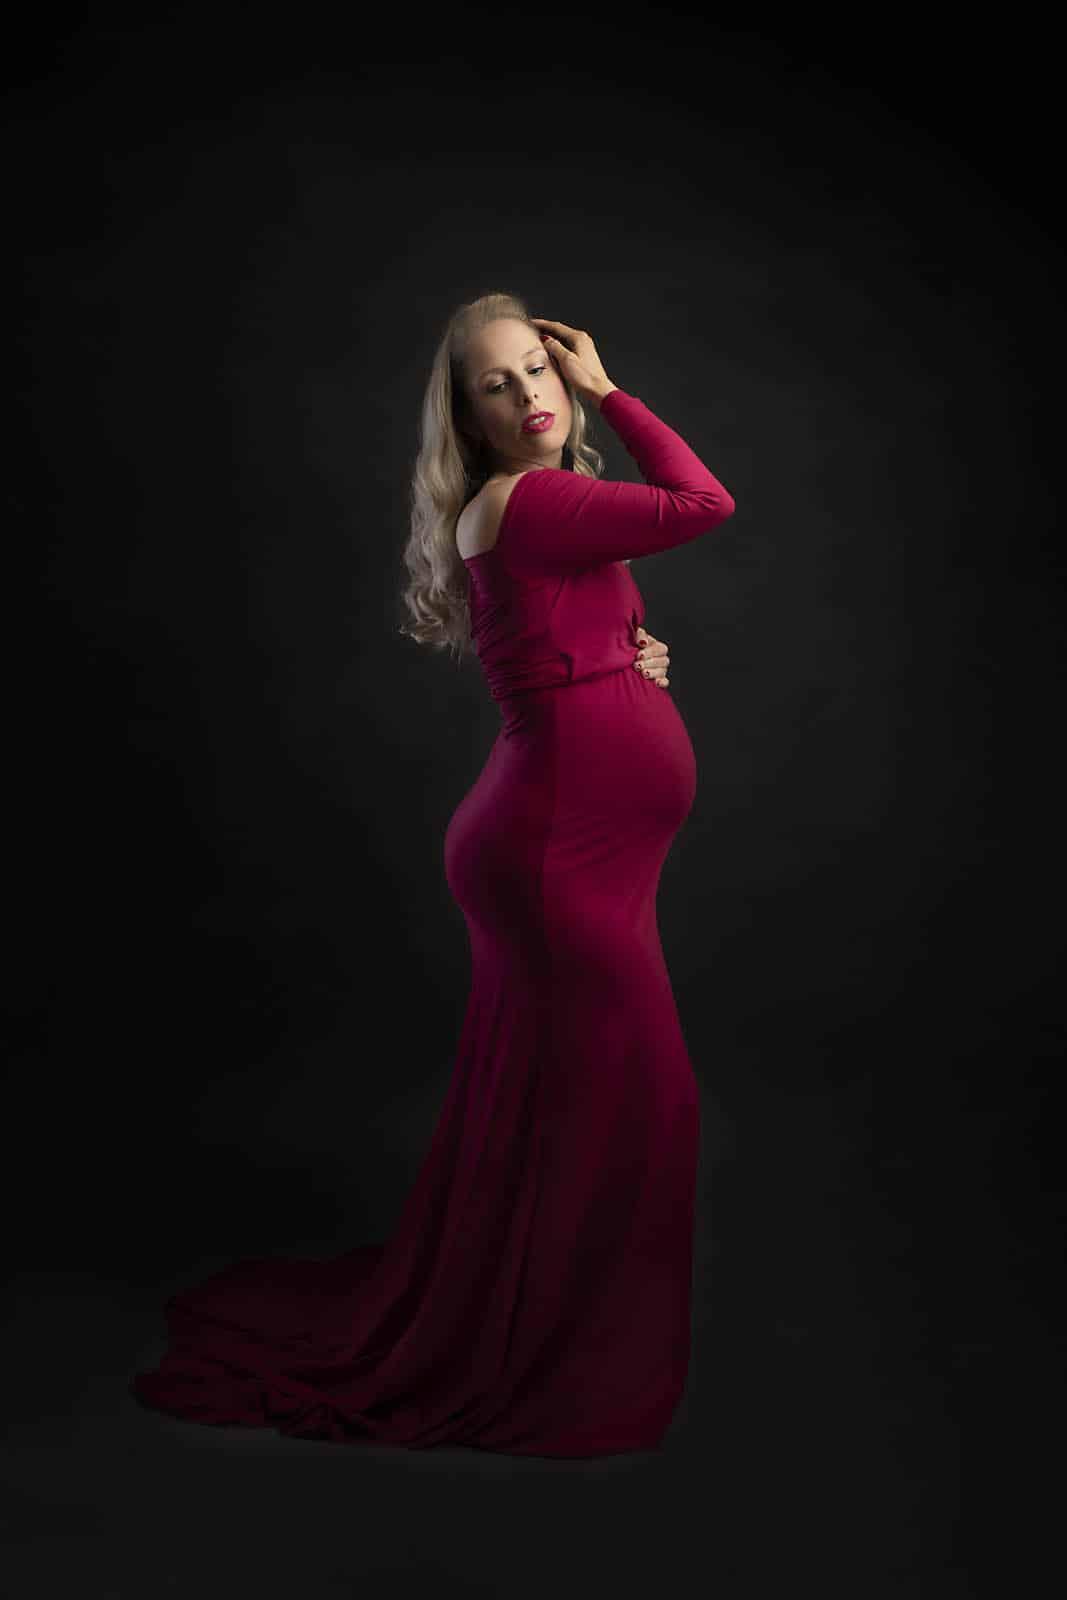 maternity portrait taken by maternity photography manchester